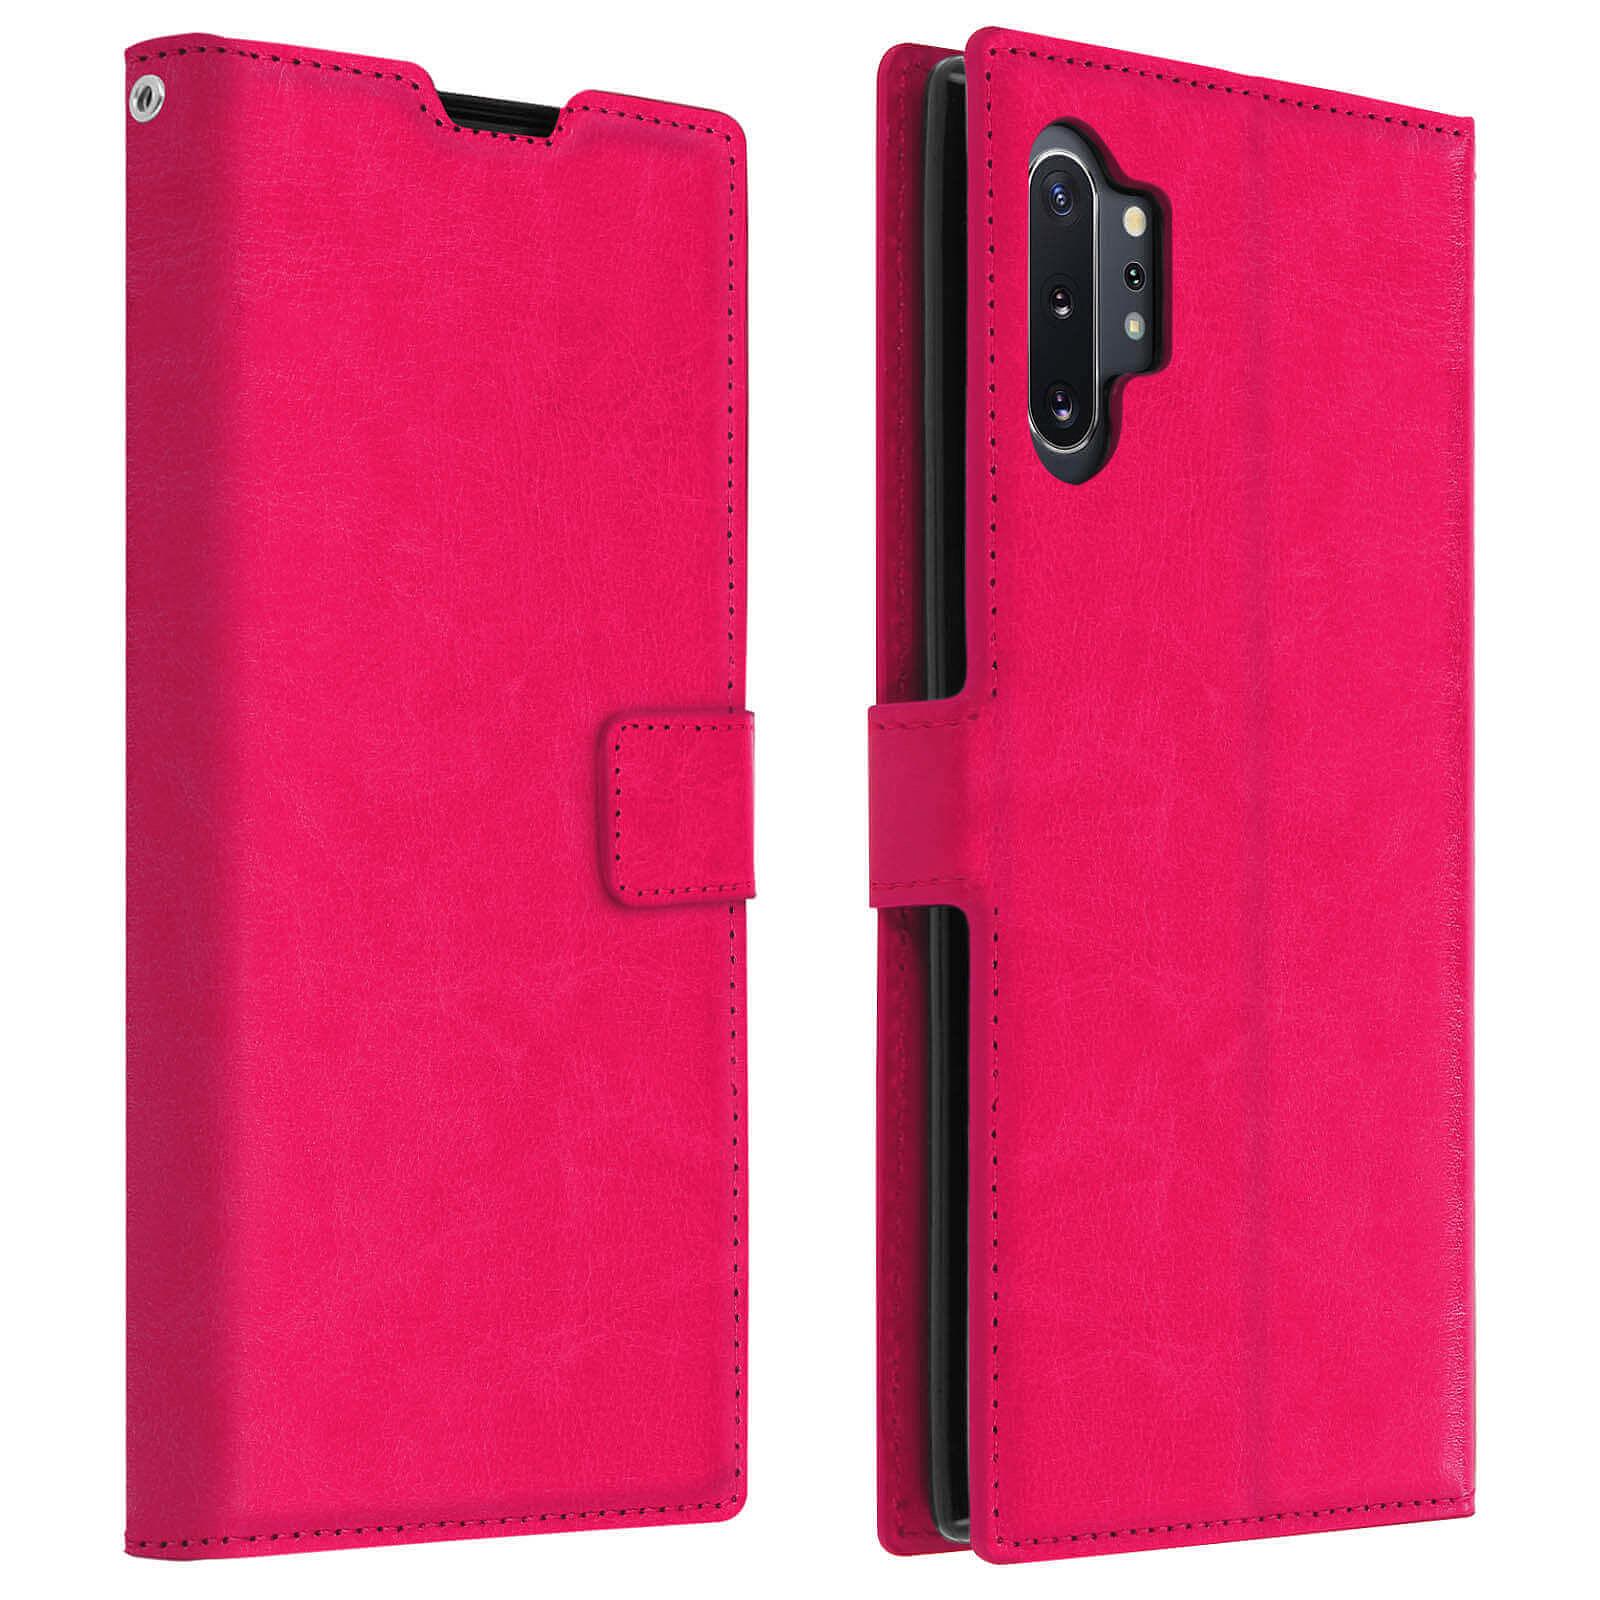 Avizar Etui folio Rose Portefeuille pour Samsung Galaxy Note 10 Plus